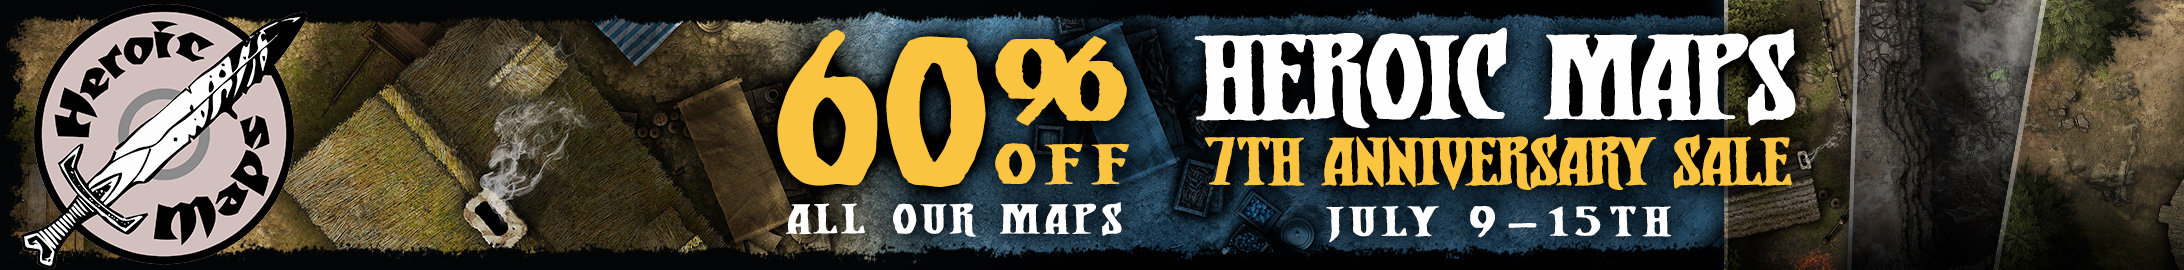 Heroic Maps 7th Anniversary sale @ DriveThruRPG.com